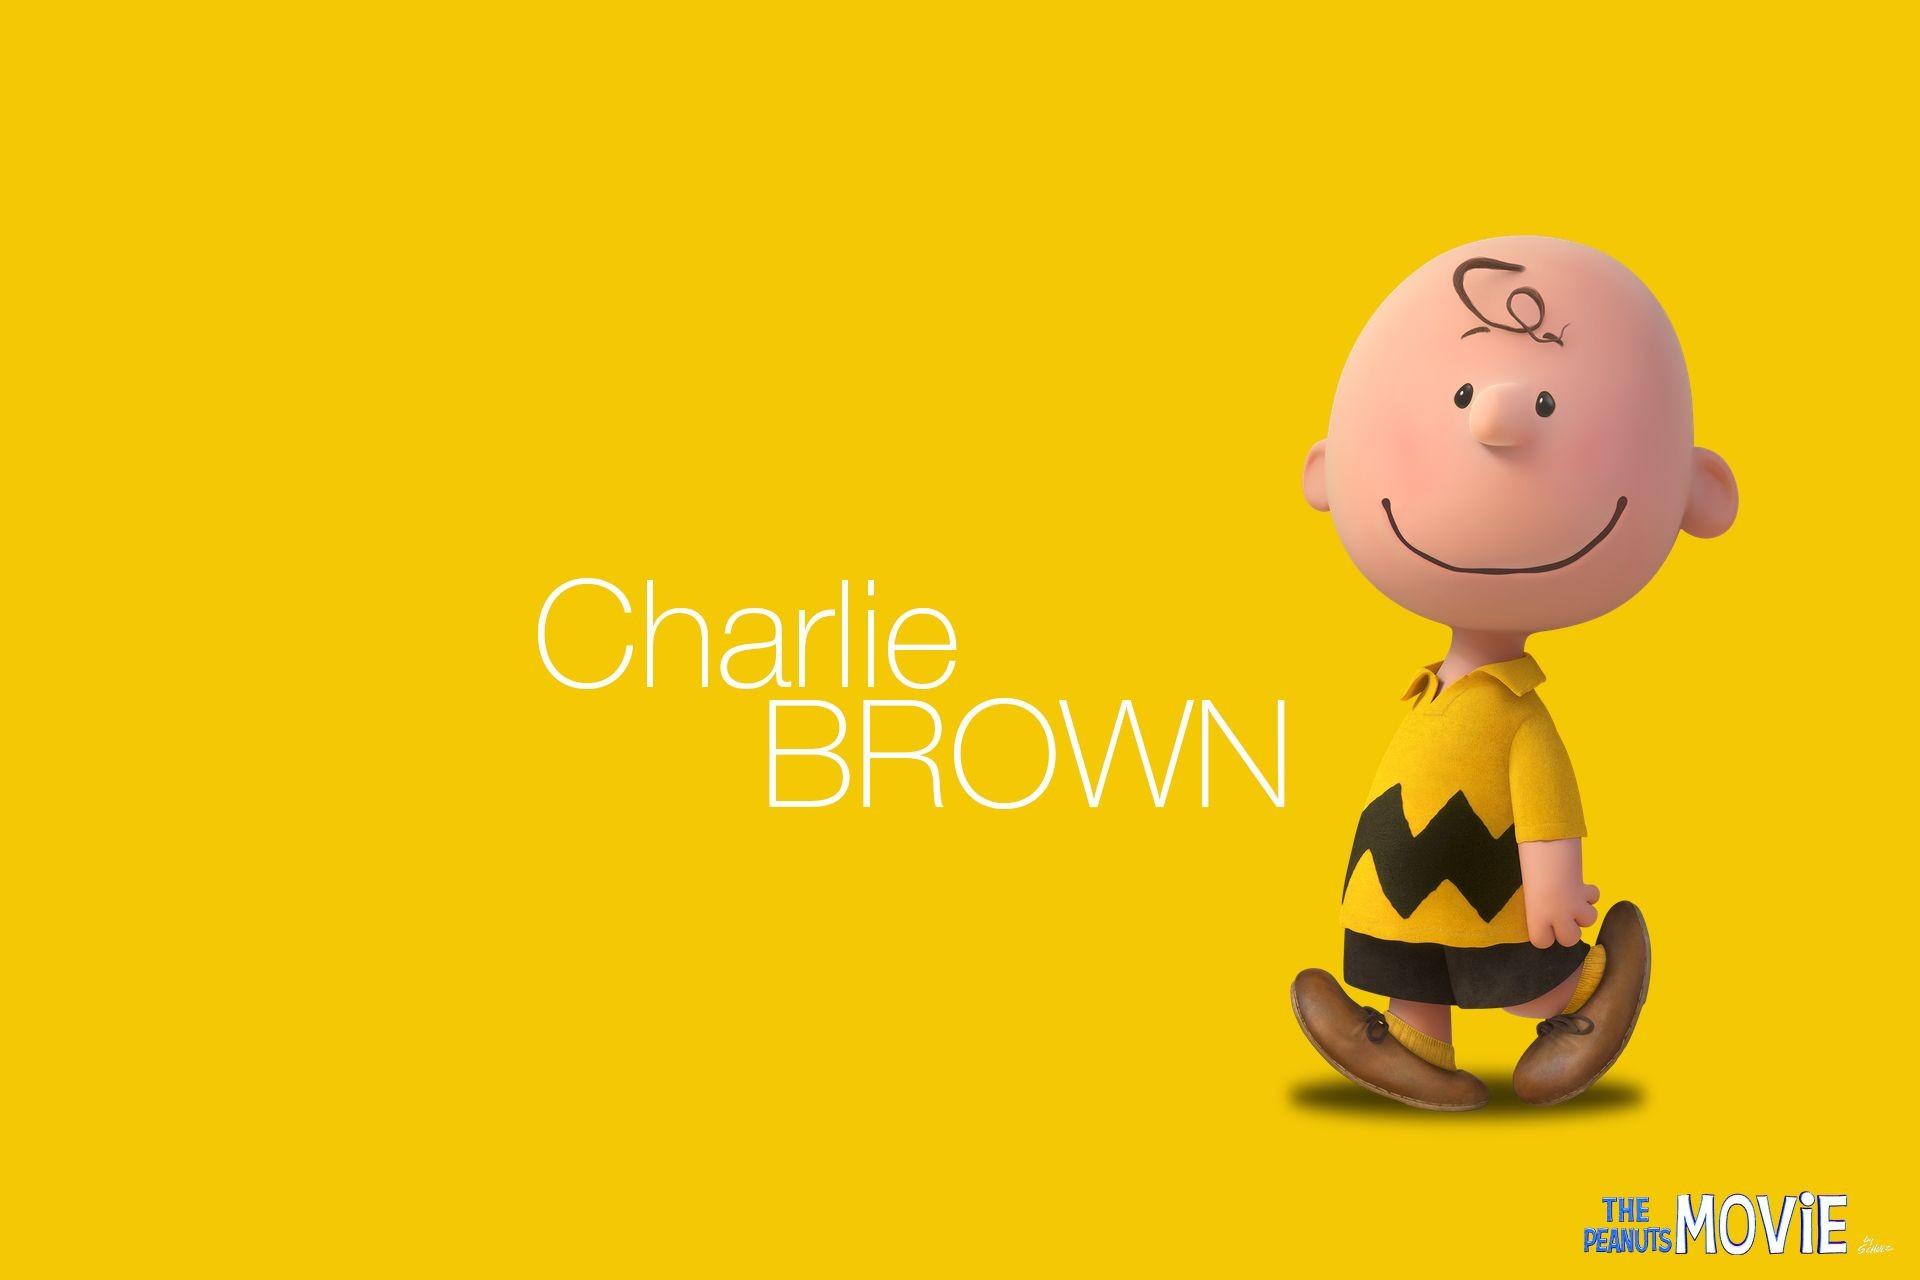 The Peanuts Movie HD wallpaper: Charlie Brown